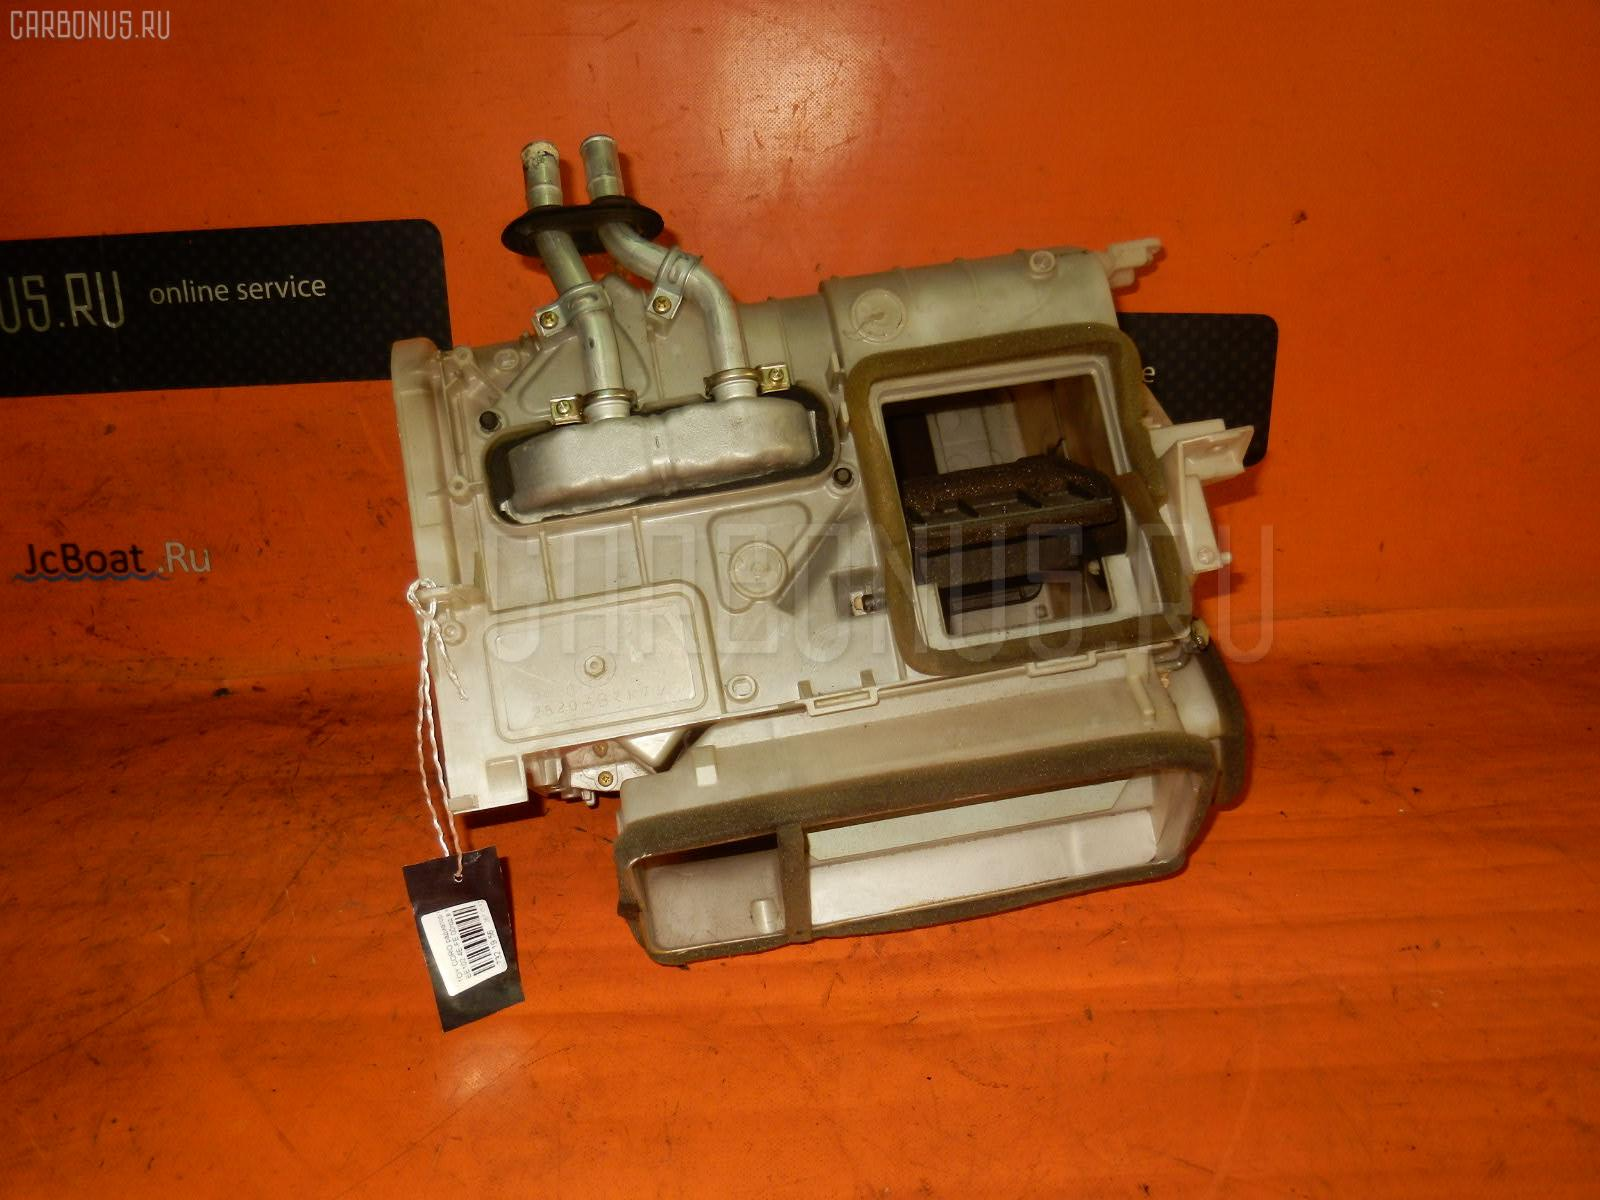 Радиатор печки TOYOTA COROLLA WAGON EE102V 4E-FE. Фото 1